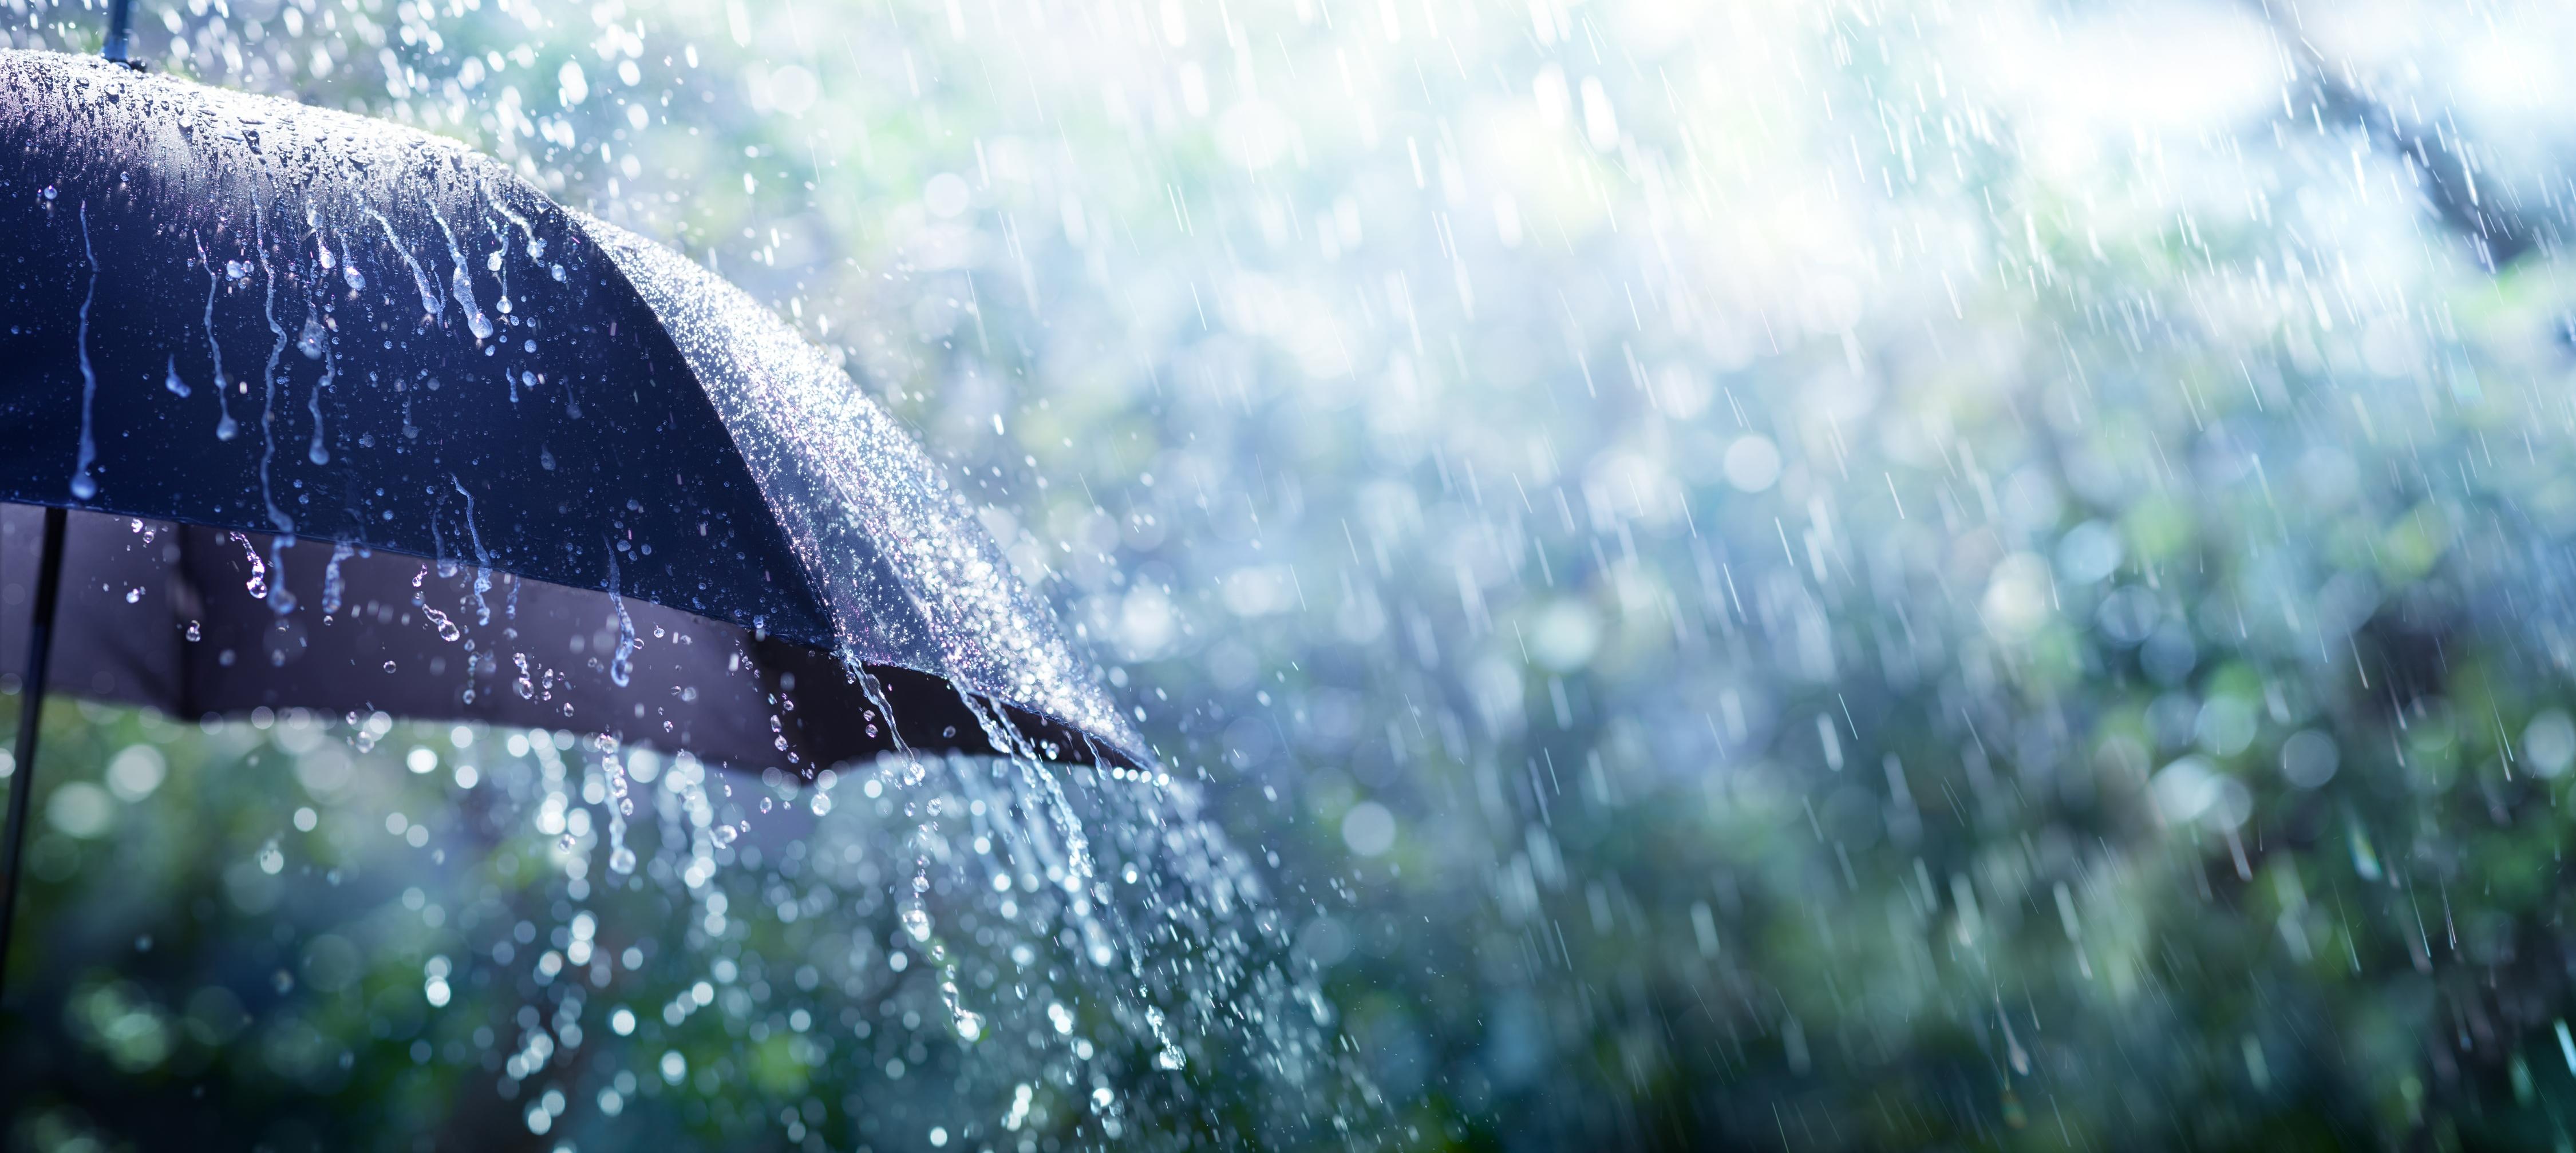 umbrella-panarama.jpg